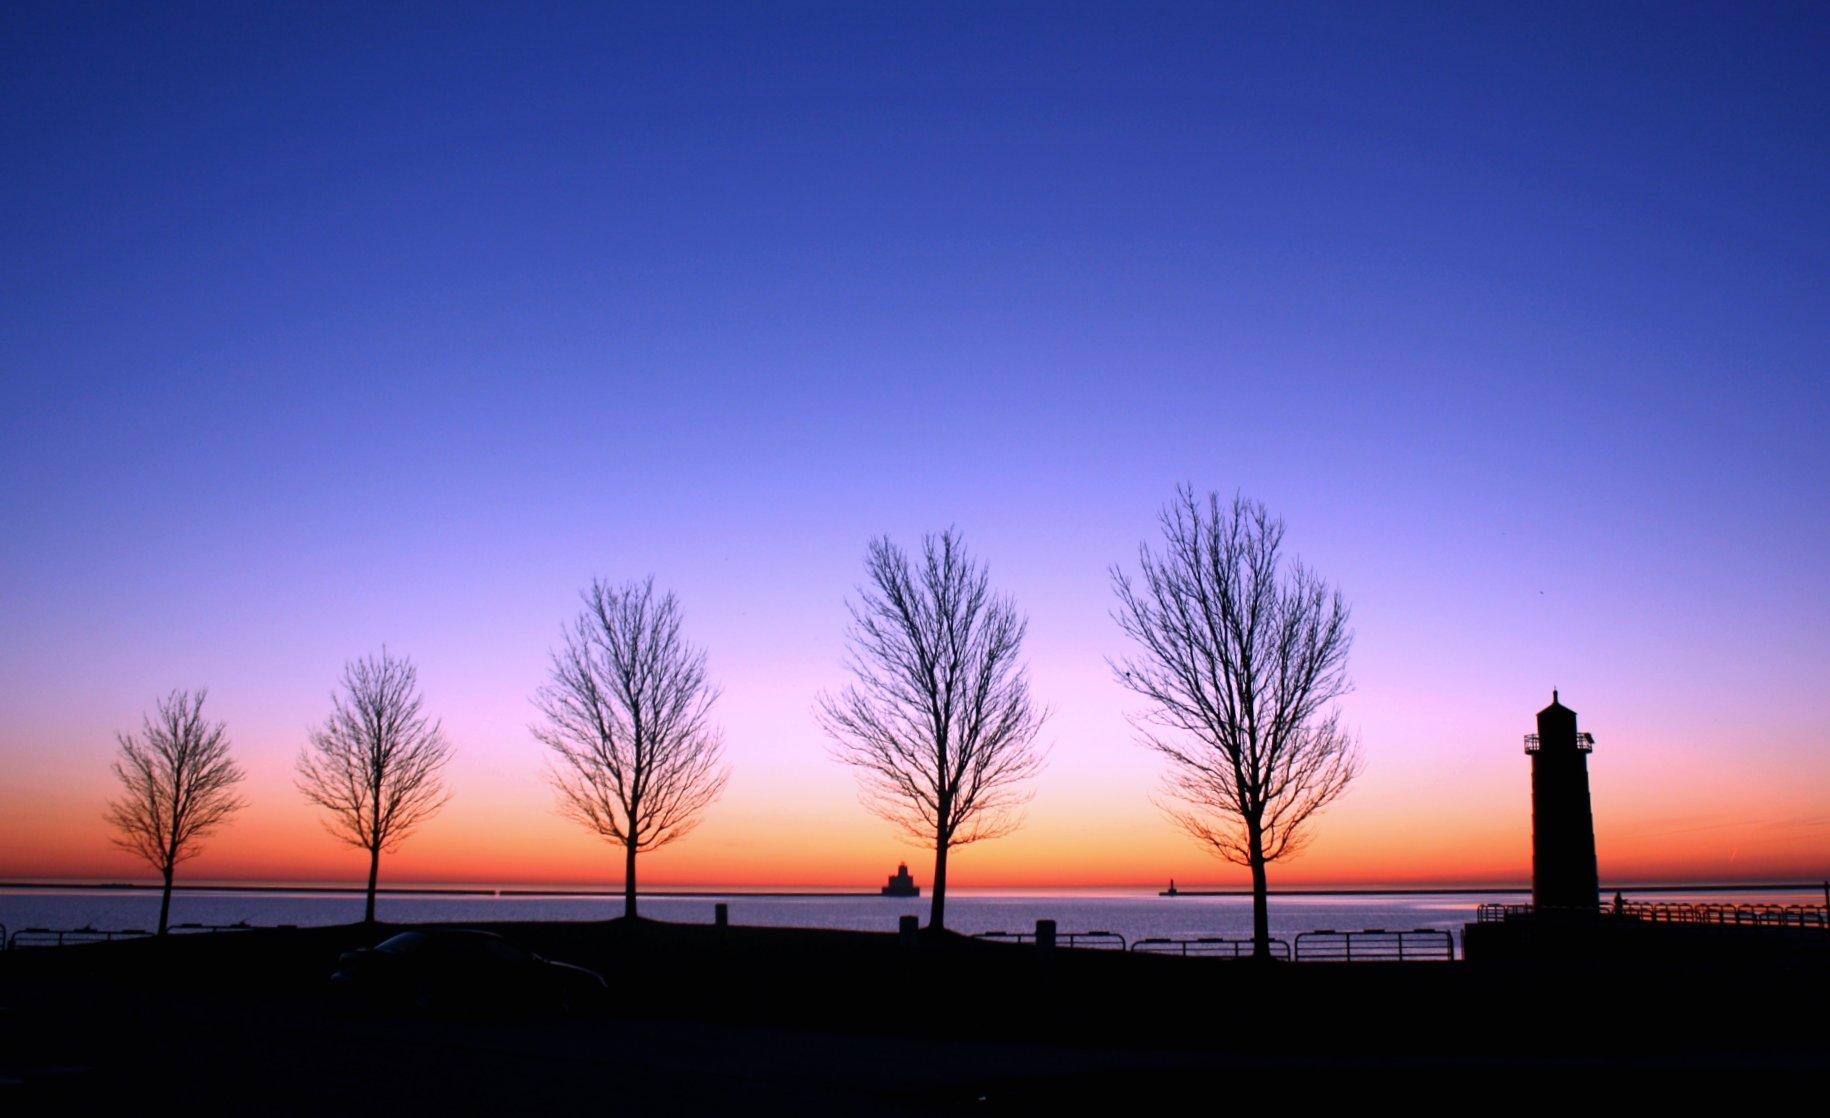 Wallpaper Landscape Sunset Silhouette Sunrise Calm